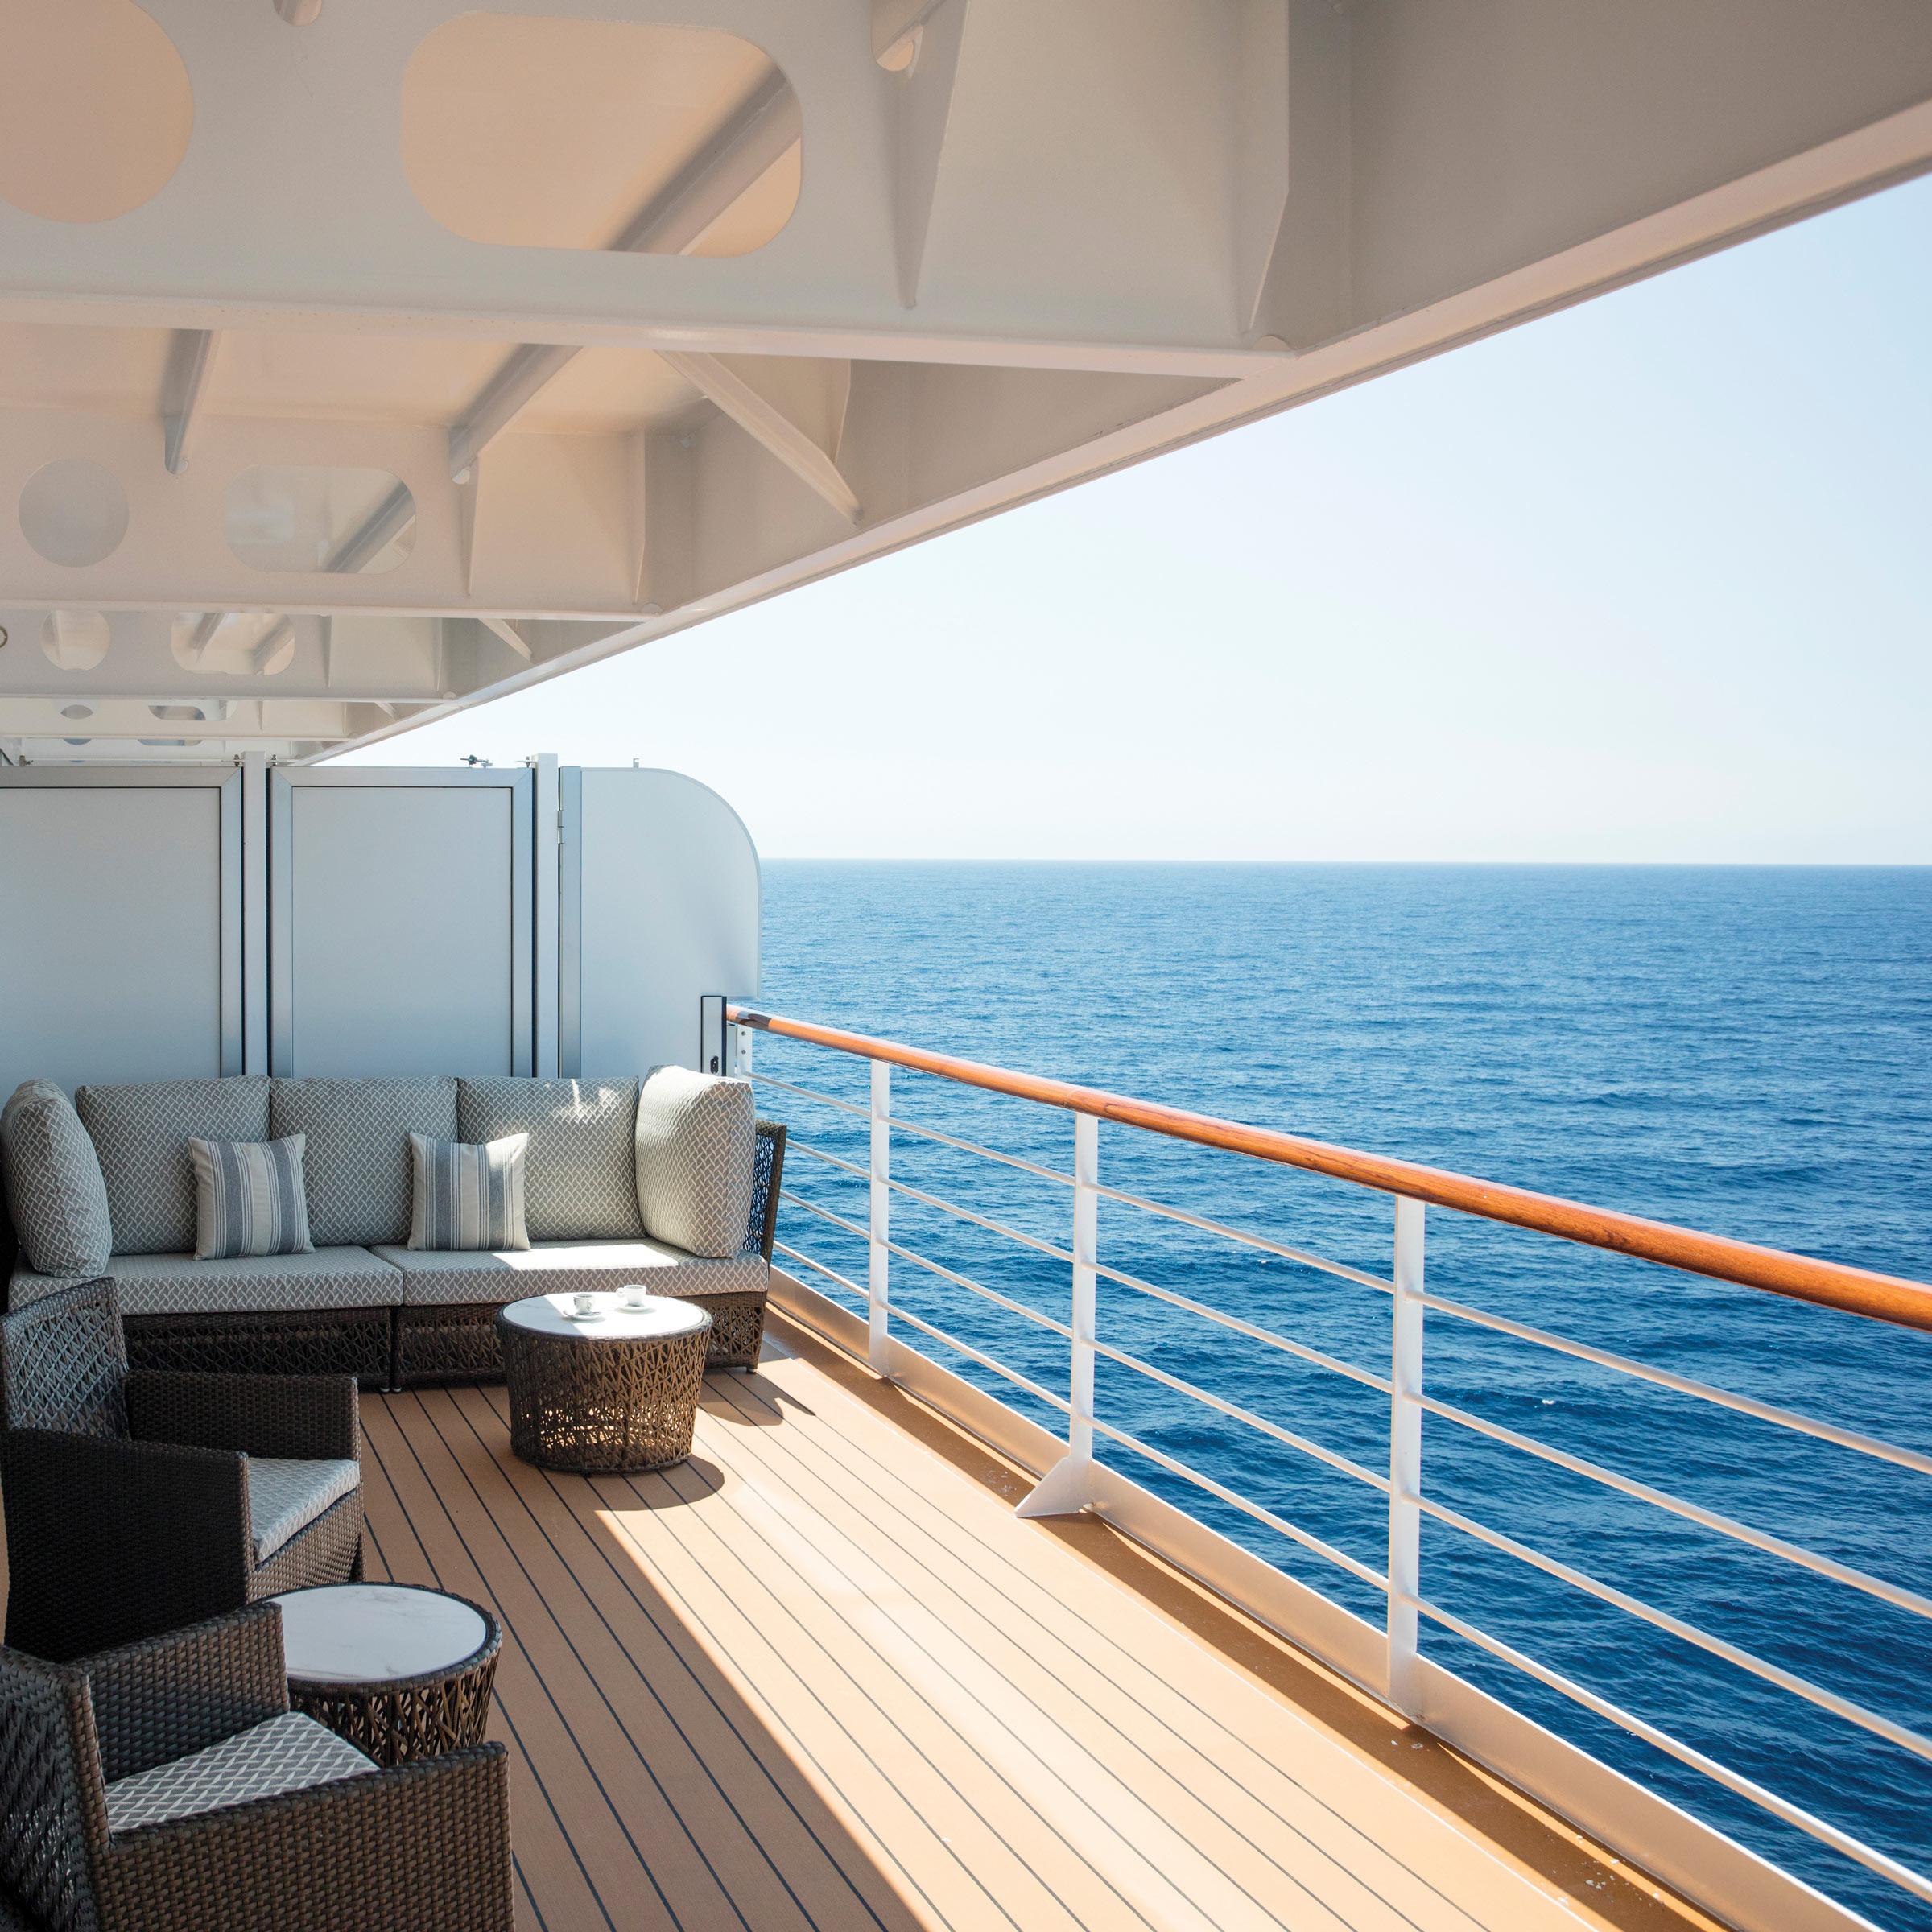 Balcony view from luxury cruise ship Explorer Regent